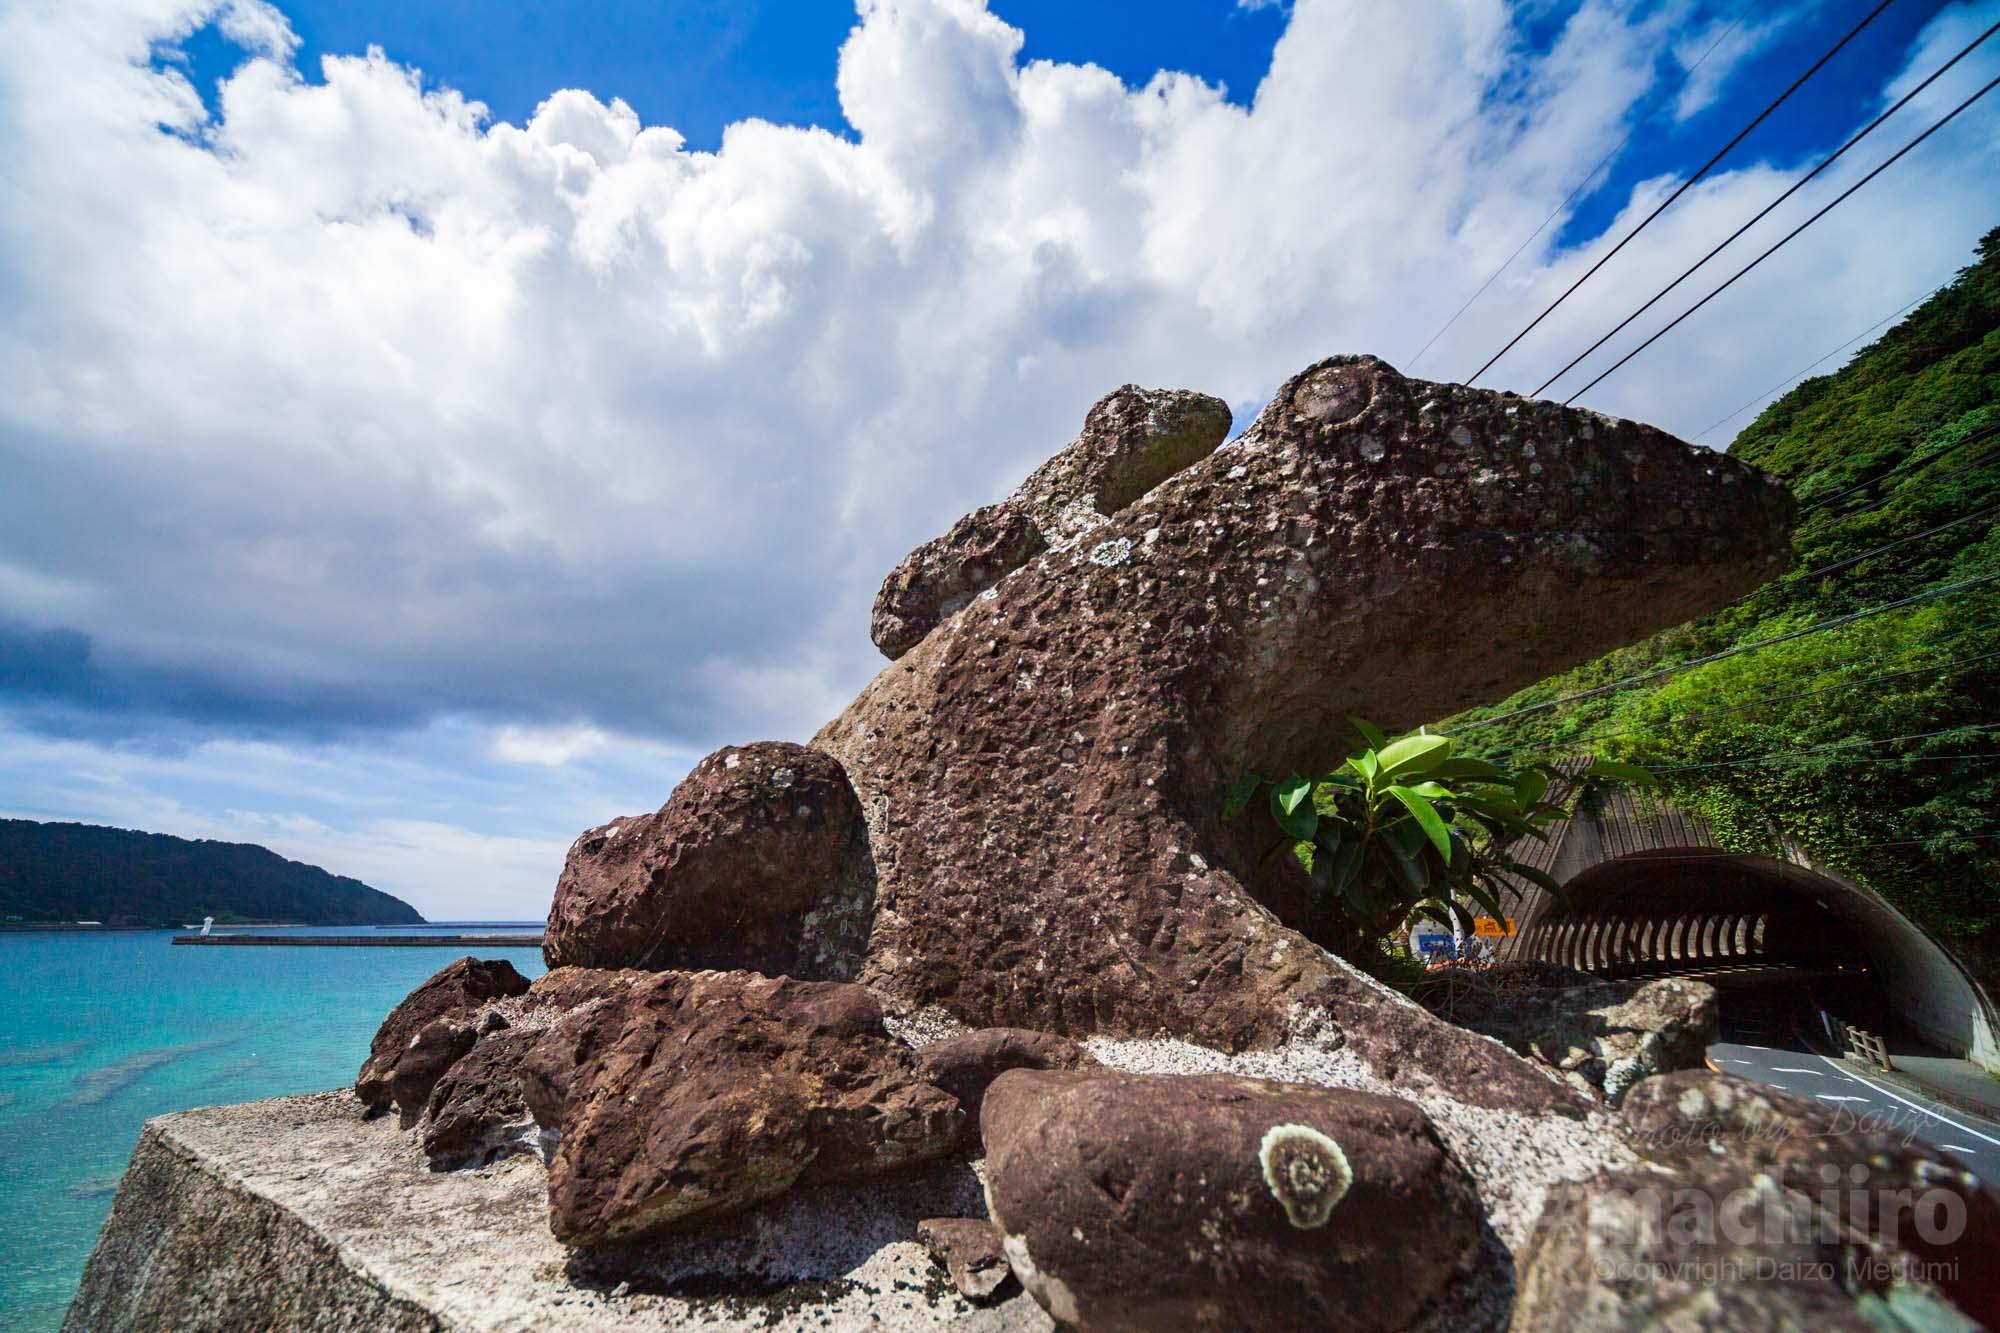 奄美探訪 旧山羊島ホテル Machiiro 記事写真 2